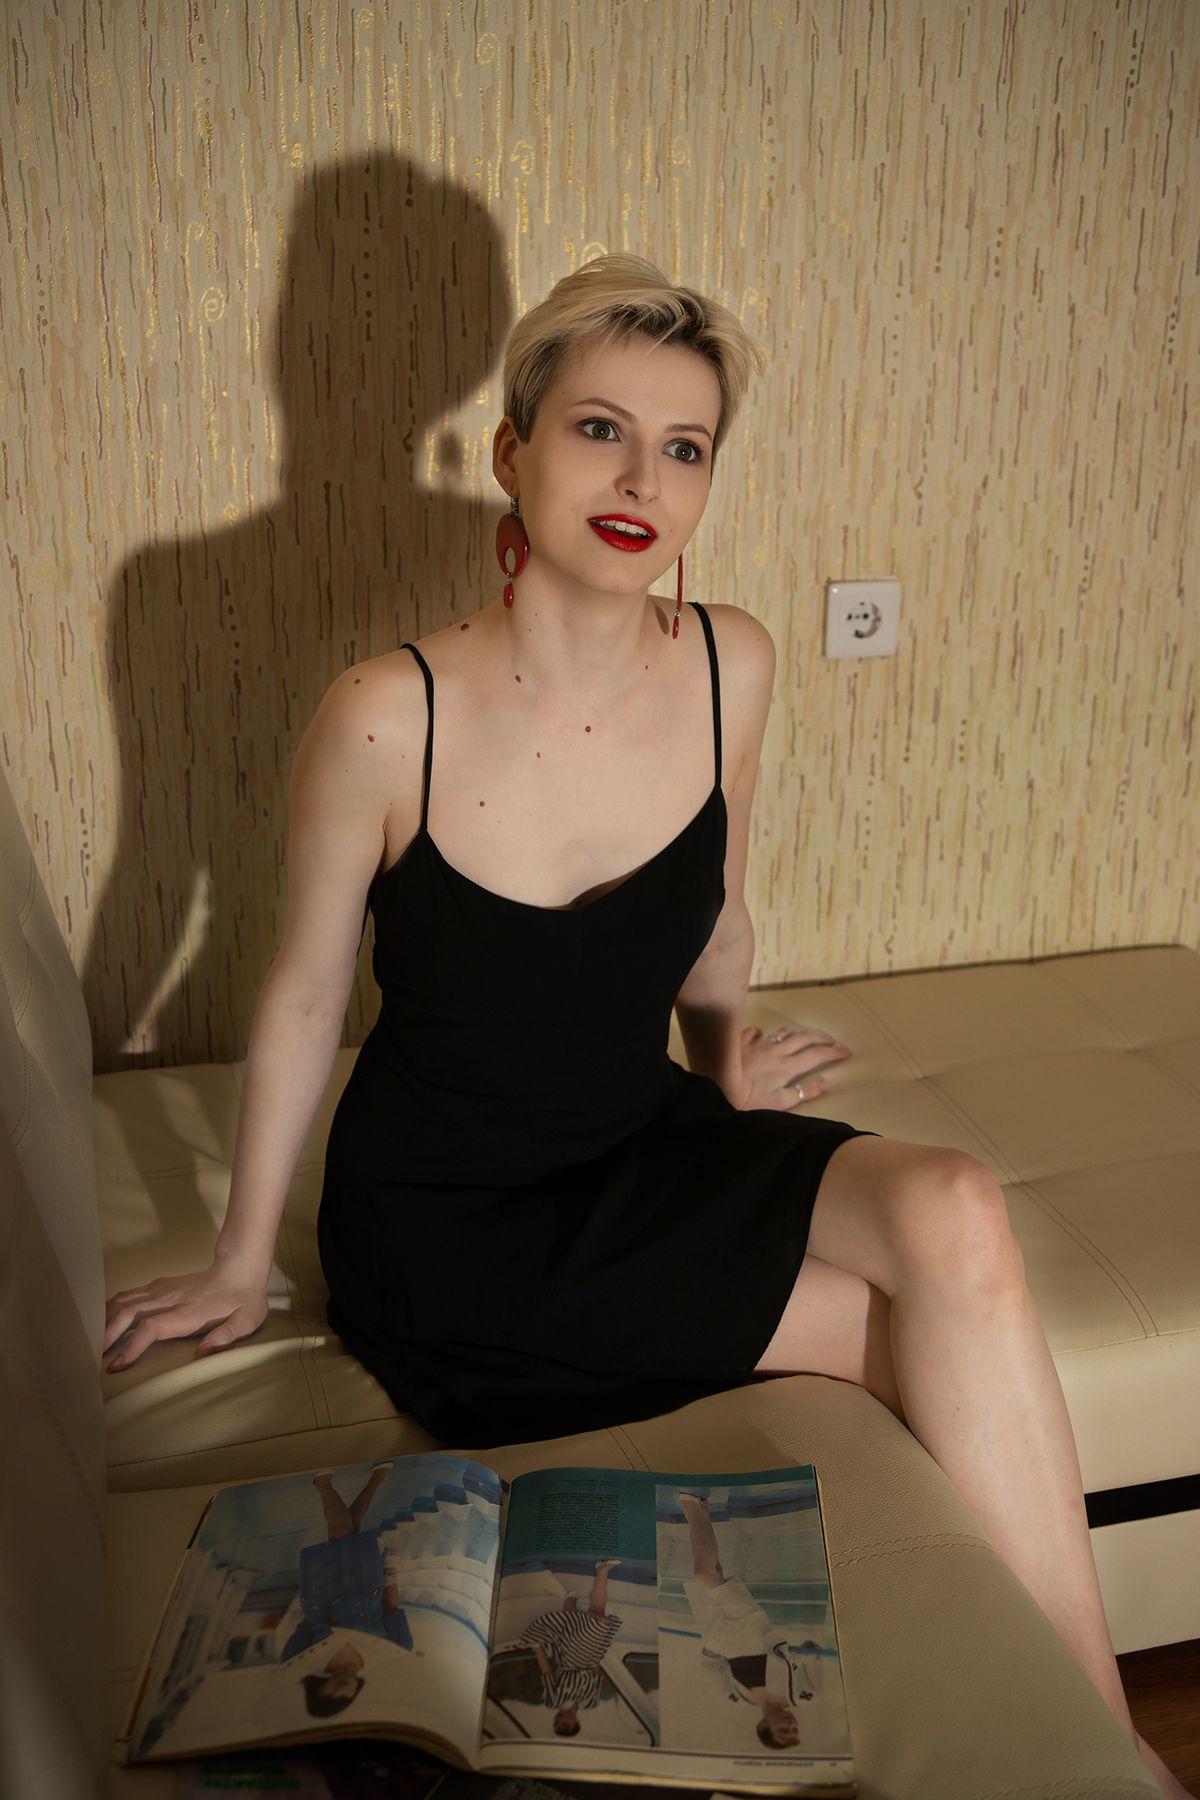 Diana девушка портрет блондинка